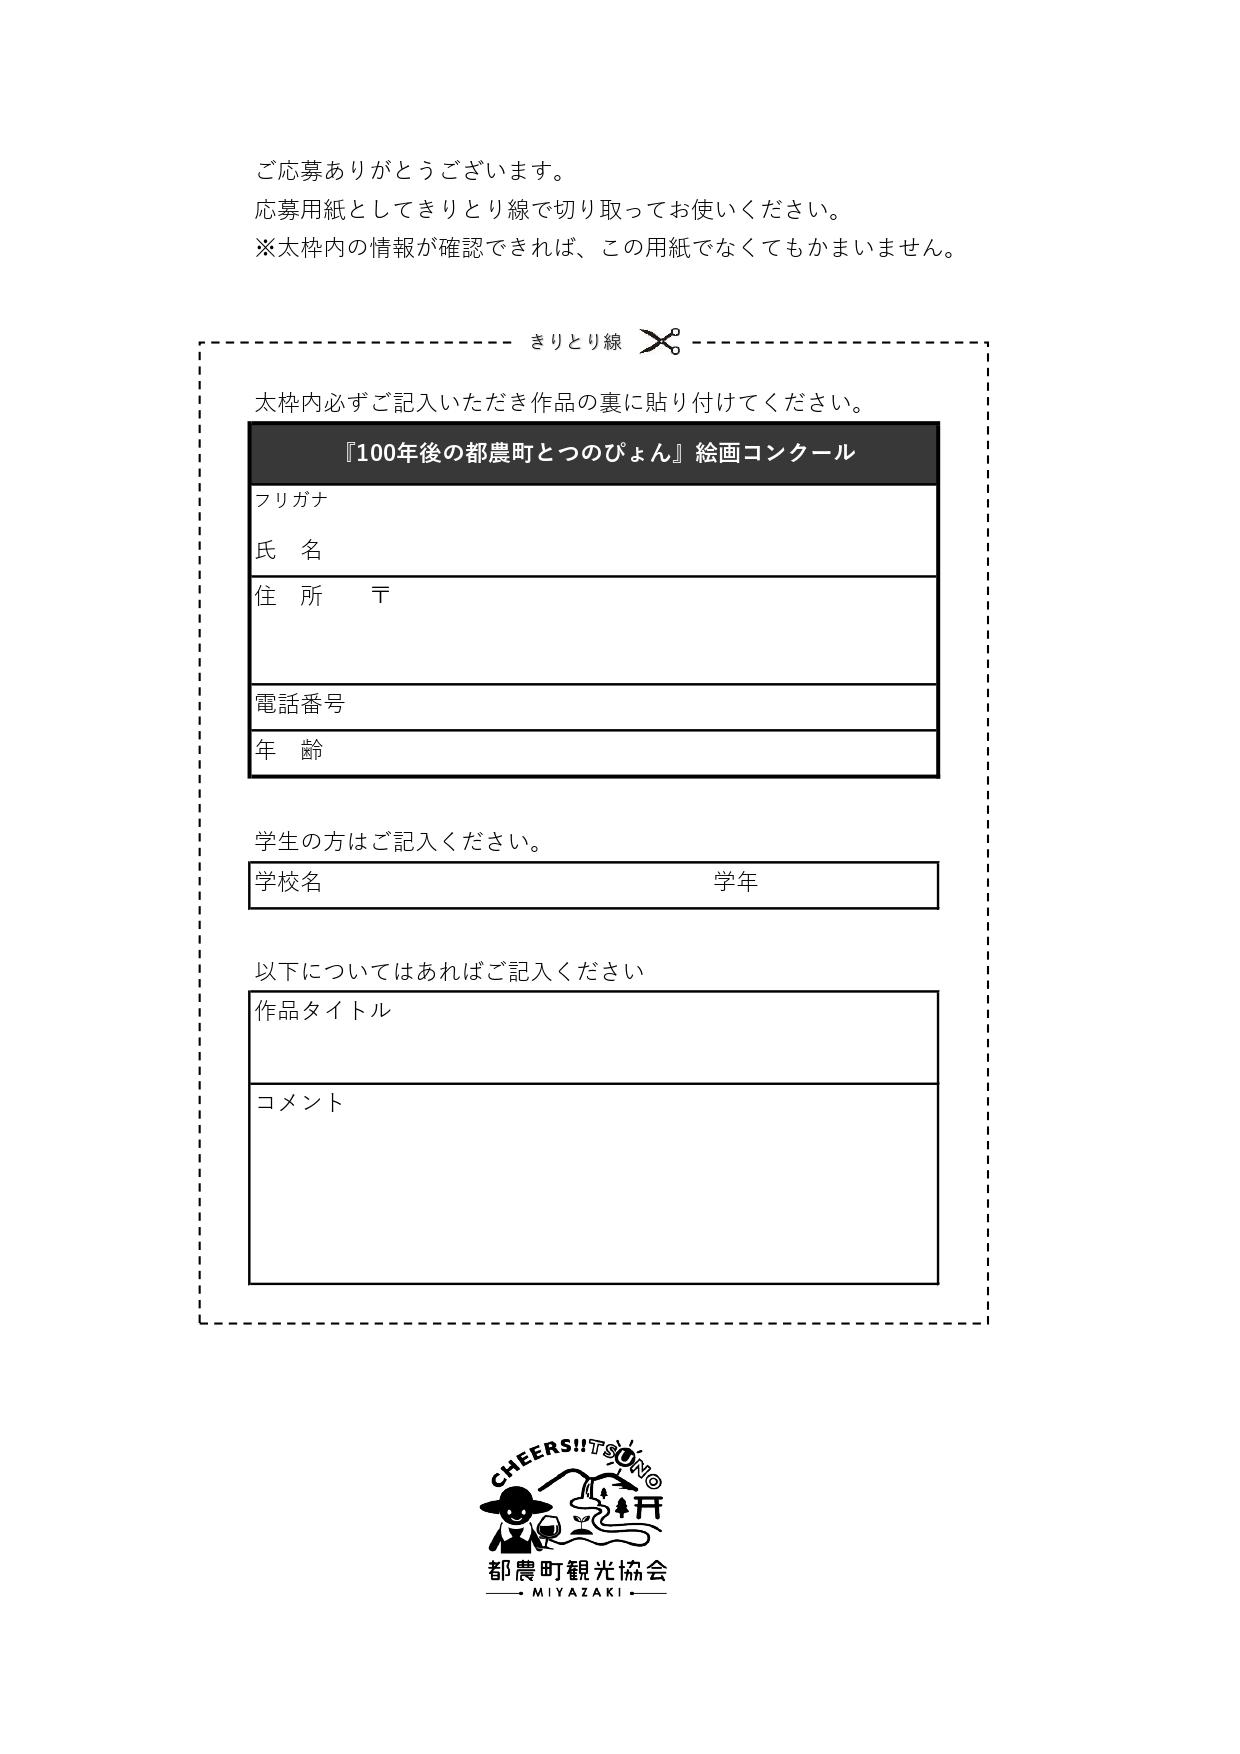 kaiga_page-0001.jpg